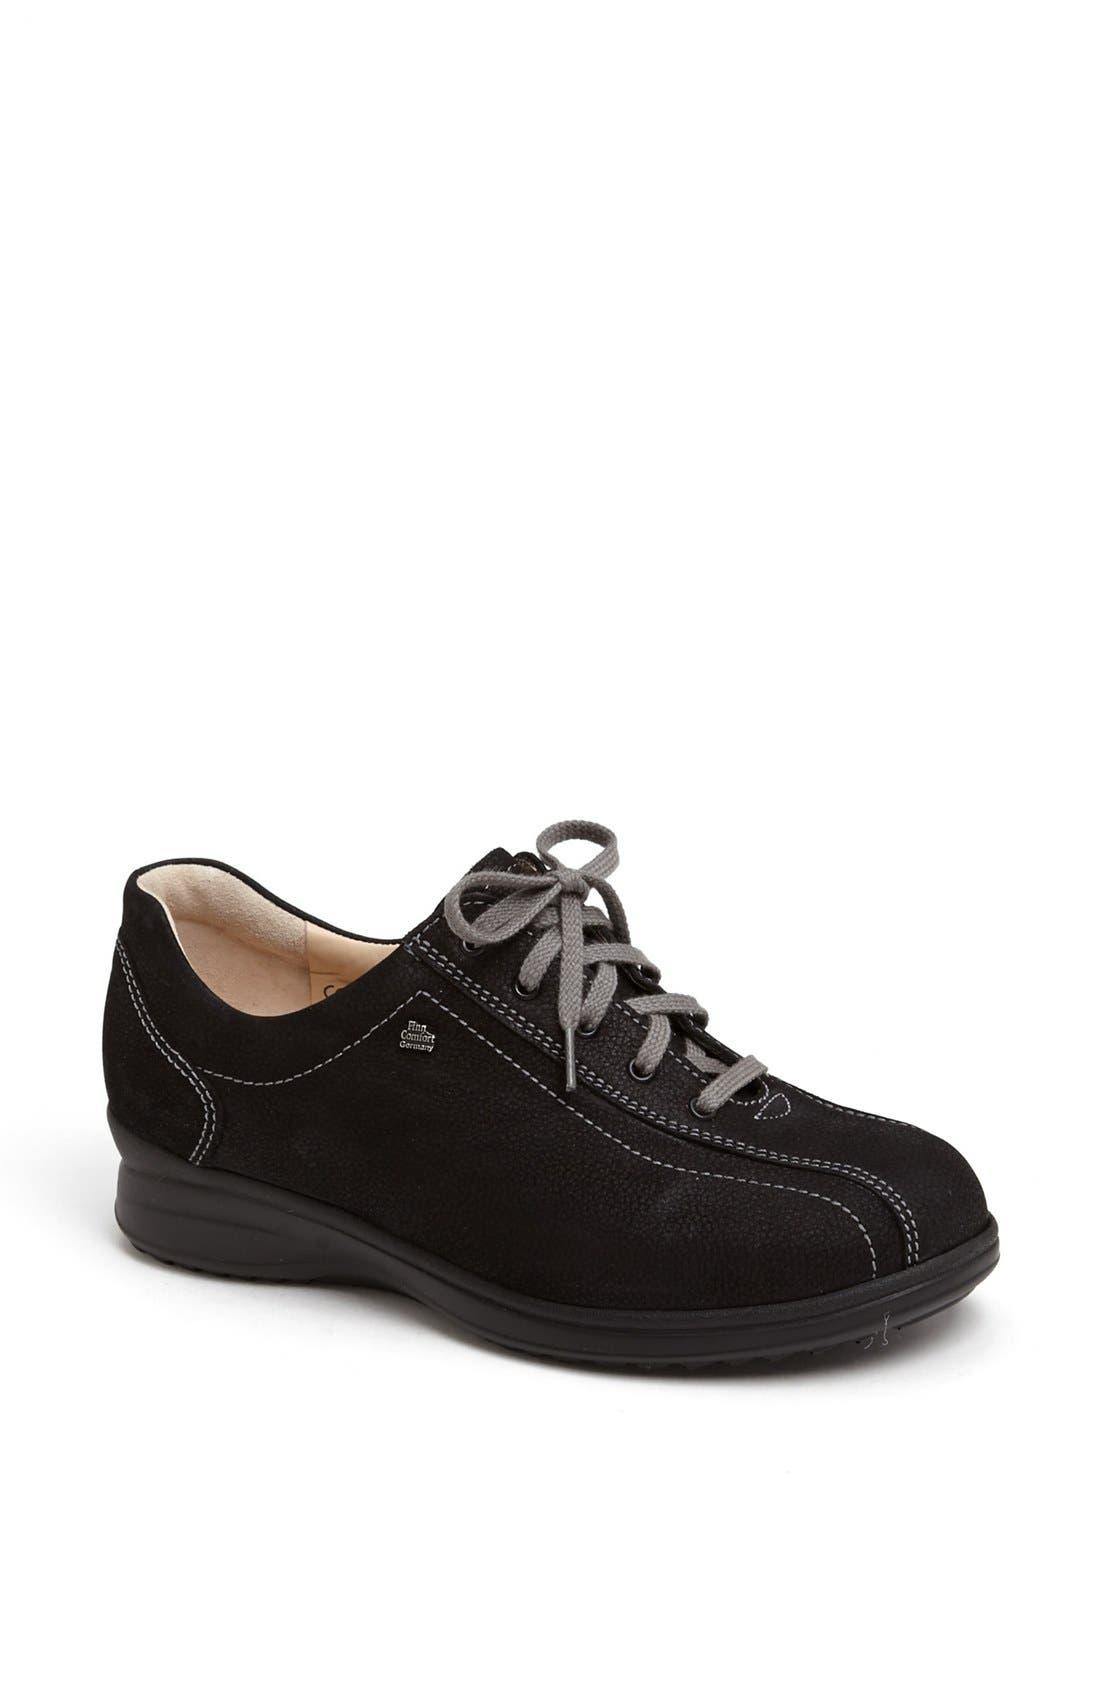 Main Image - Finn Comfort 'Almeria' Sneaker